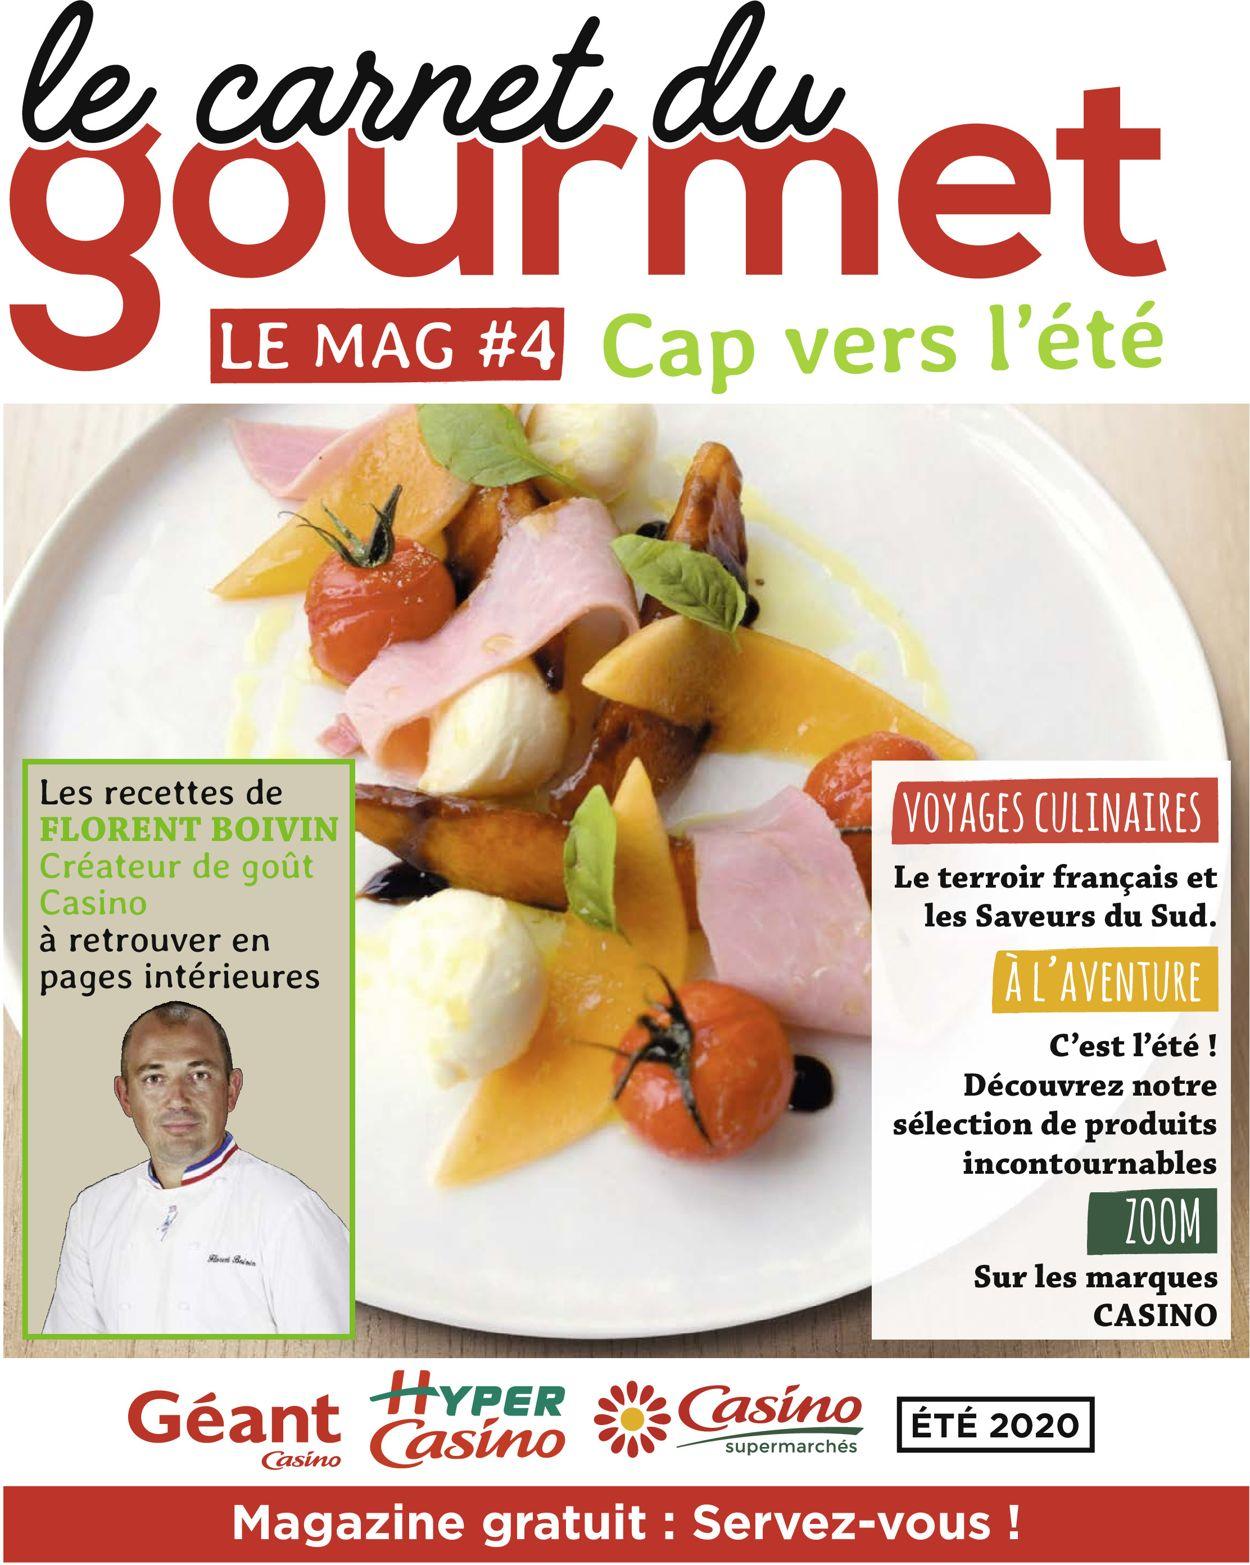 Géant Casino Catalogue - 15.06-31.08.2020